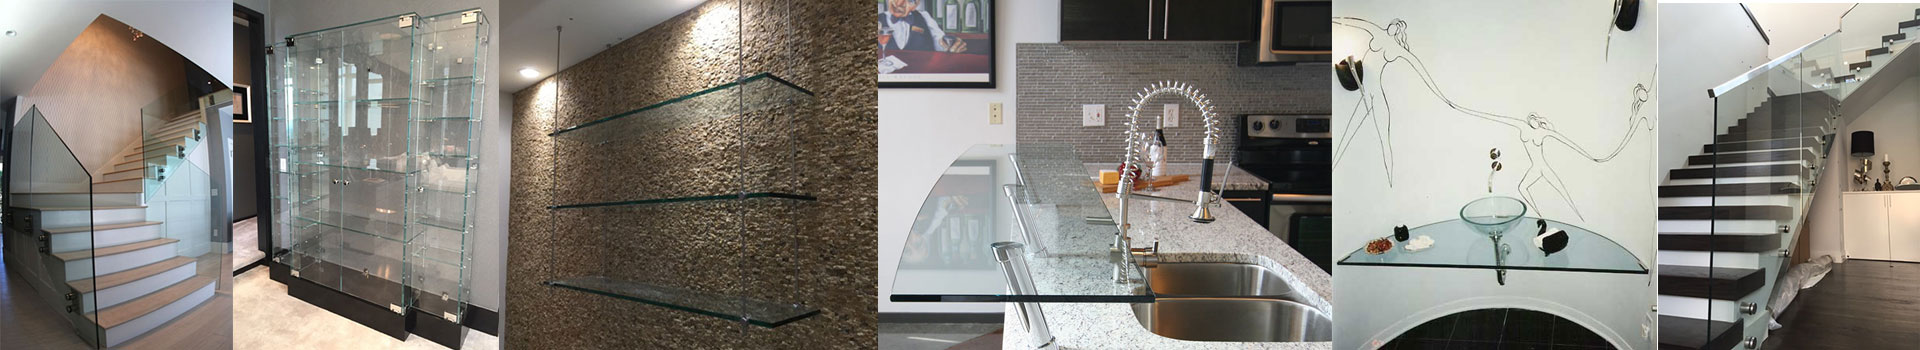 . Shower Door Installation Dallas  TX   Custom Shower   Tub Enclosures